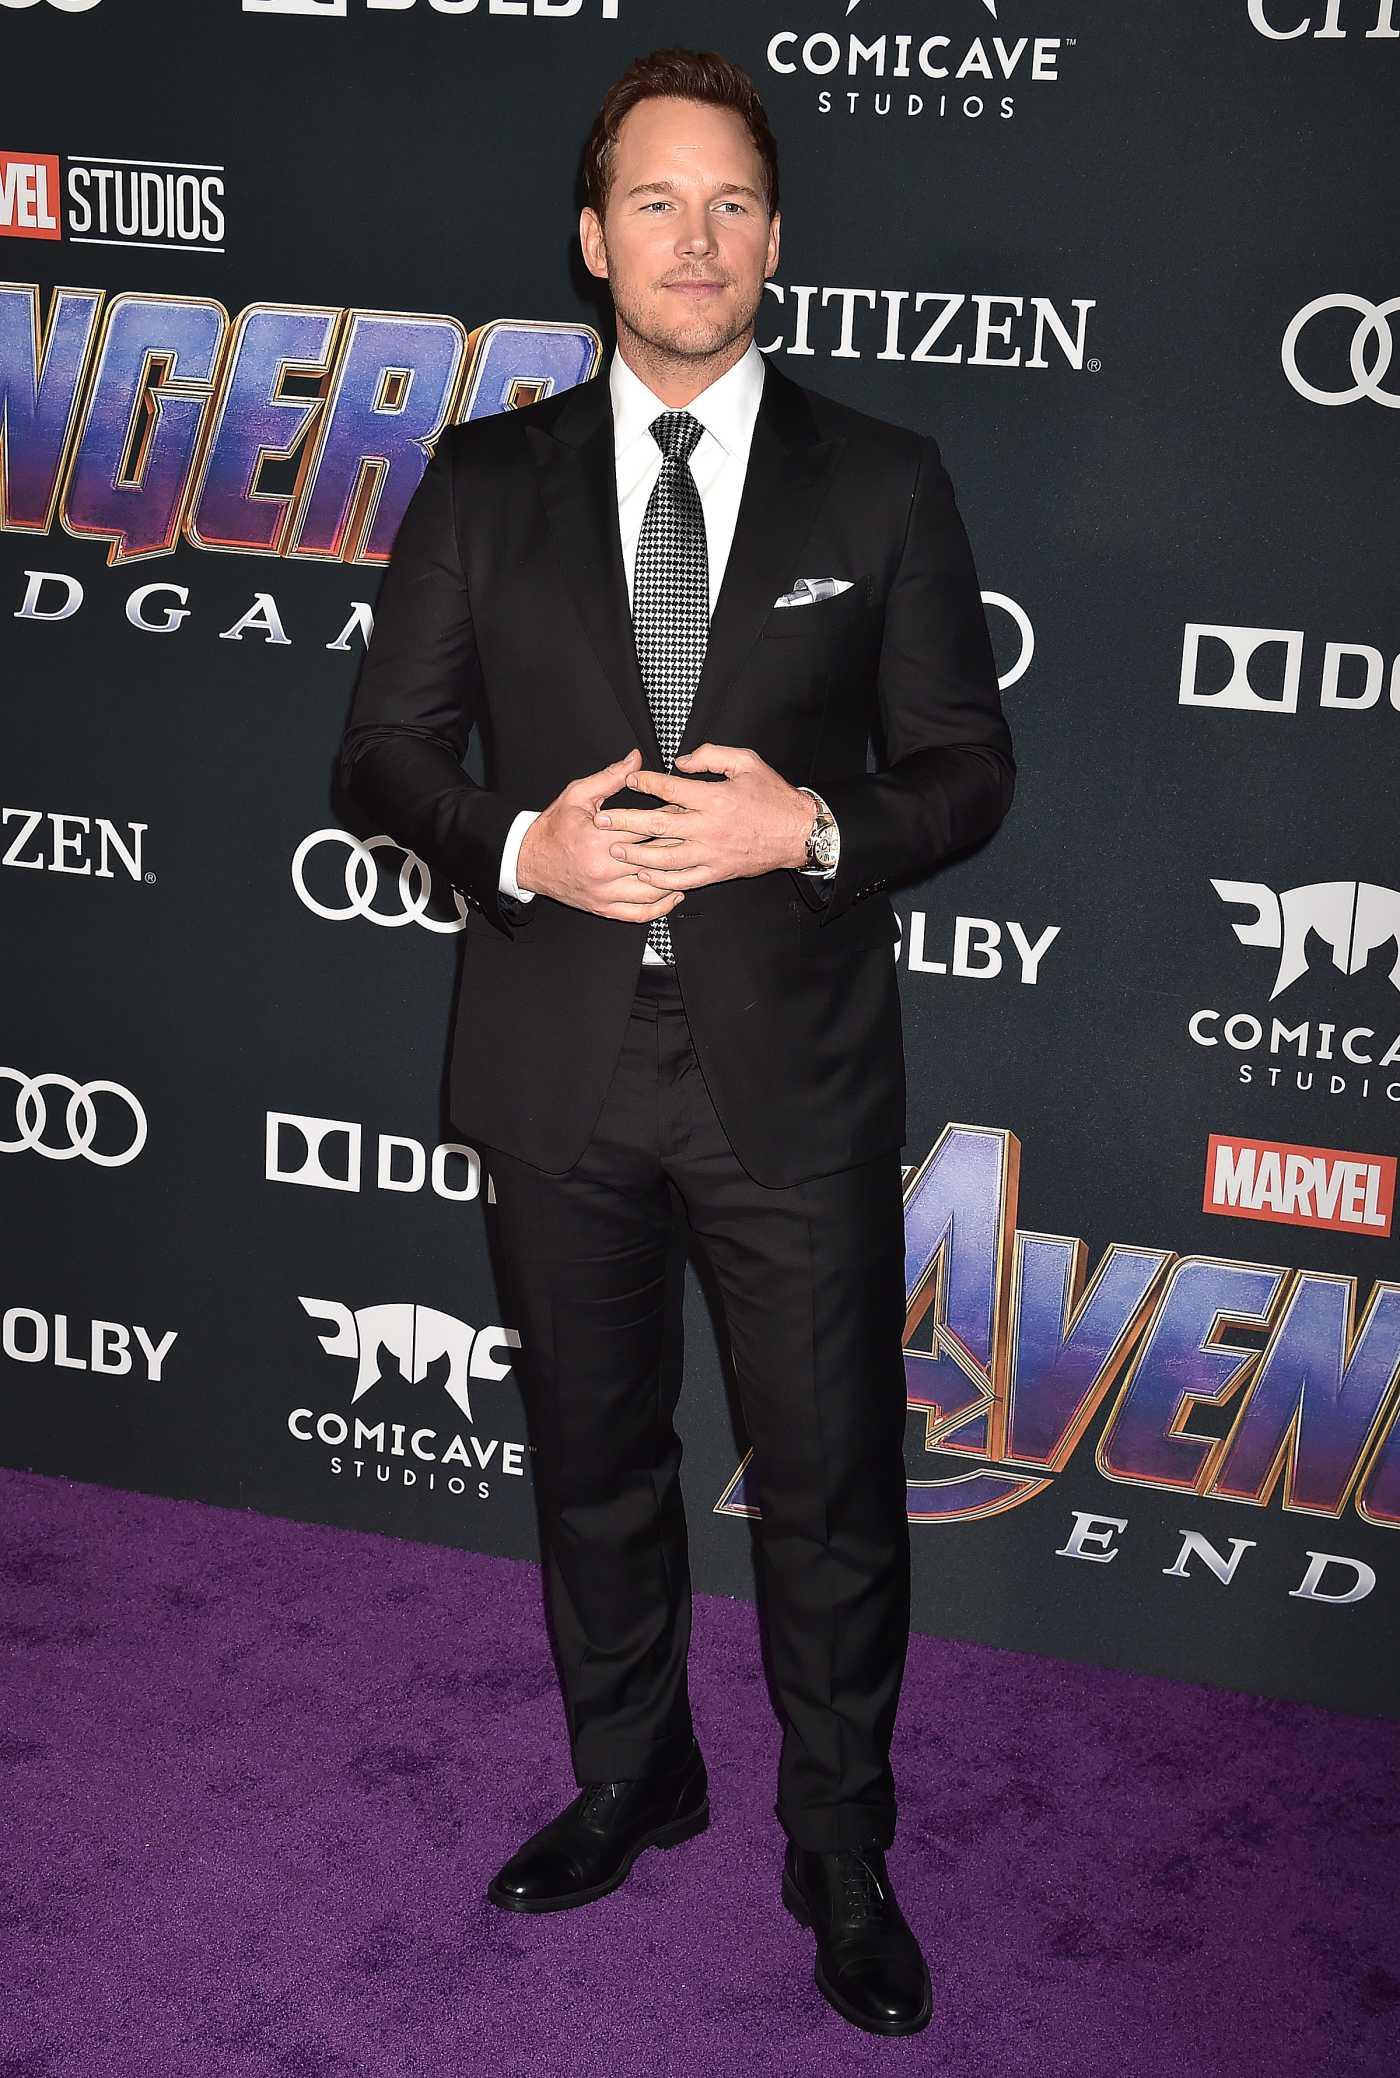 Chris Pratt Attends Avengers: Endgame Premiere in Los Angeles 04/22/2019